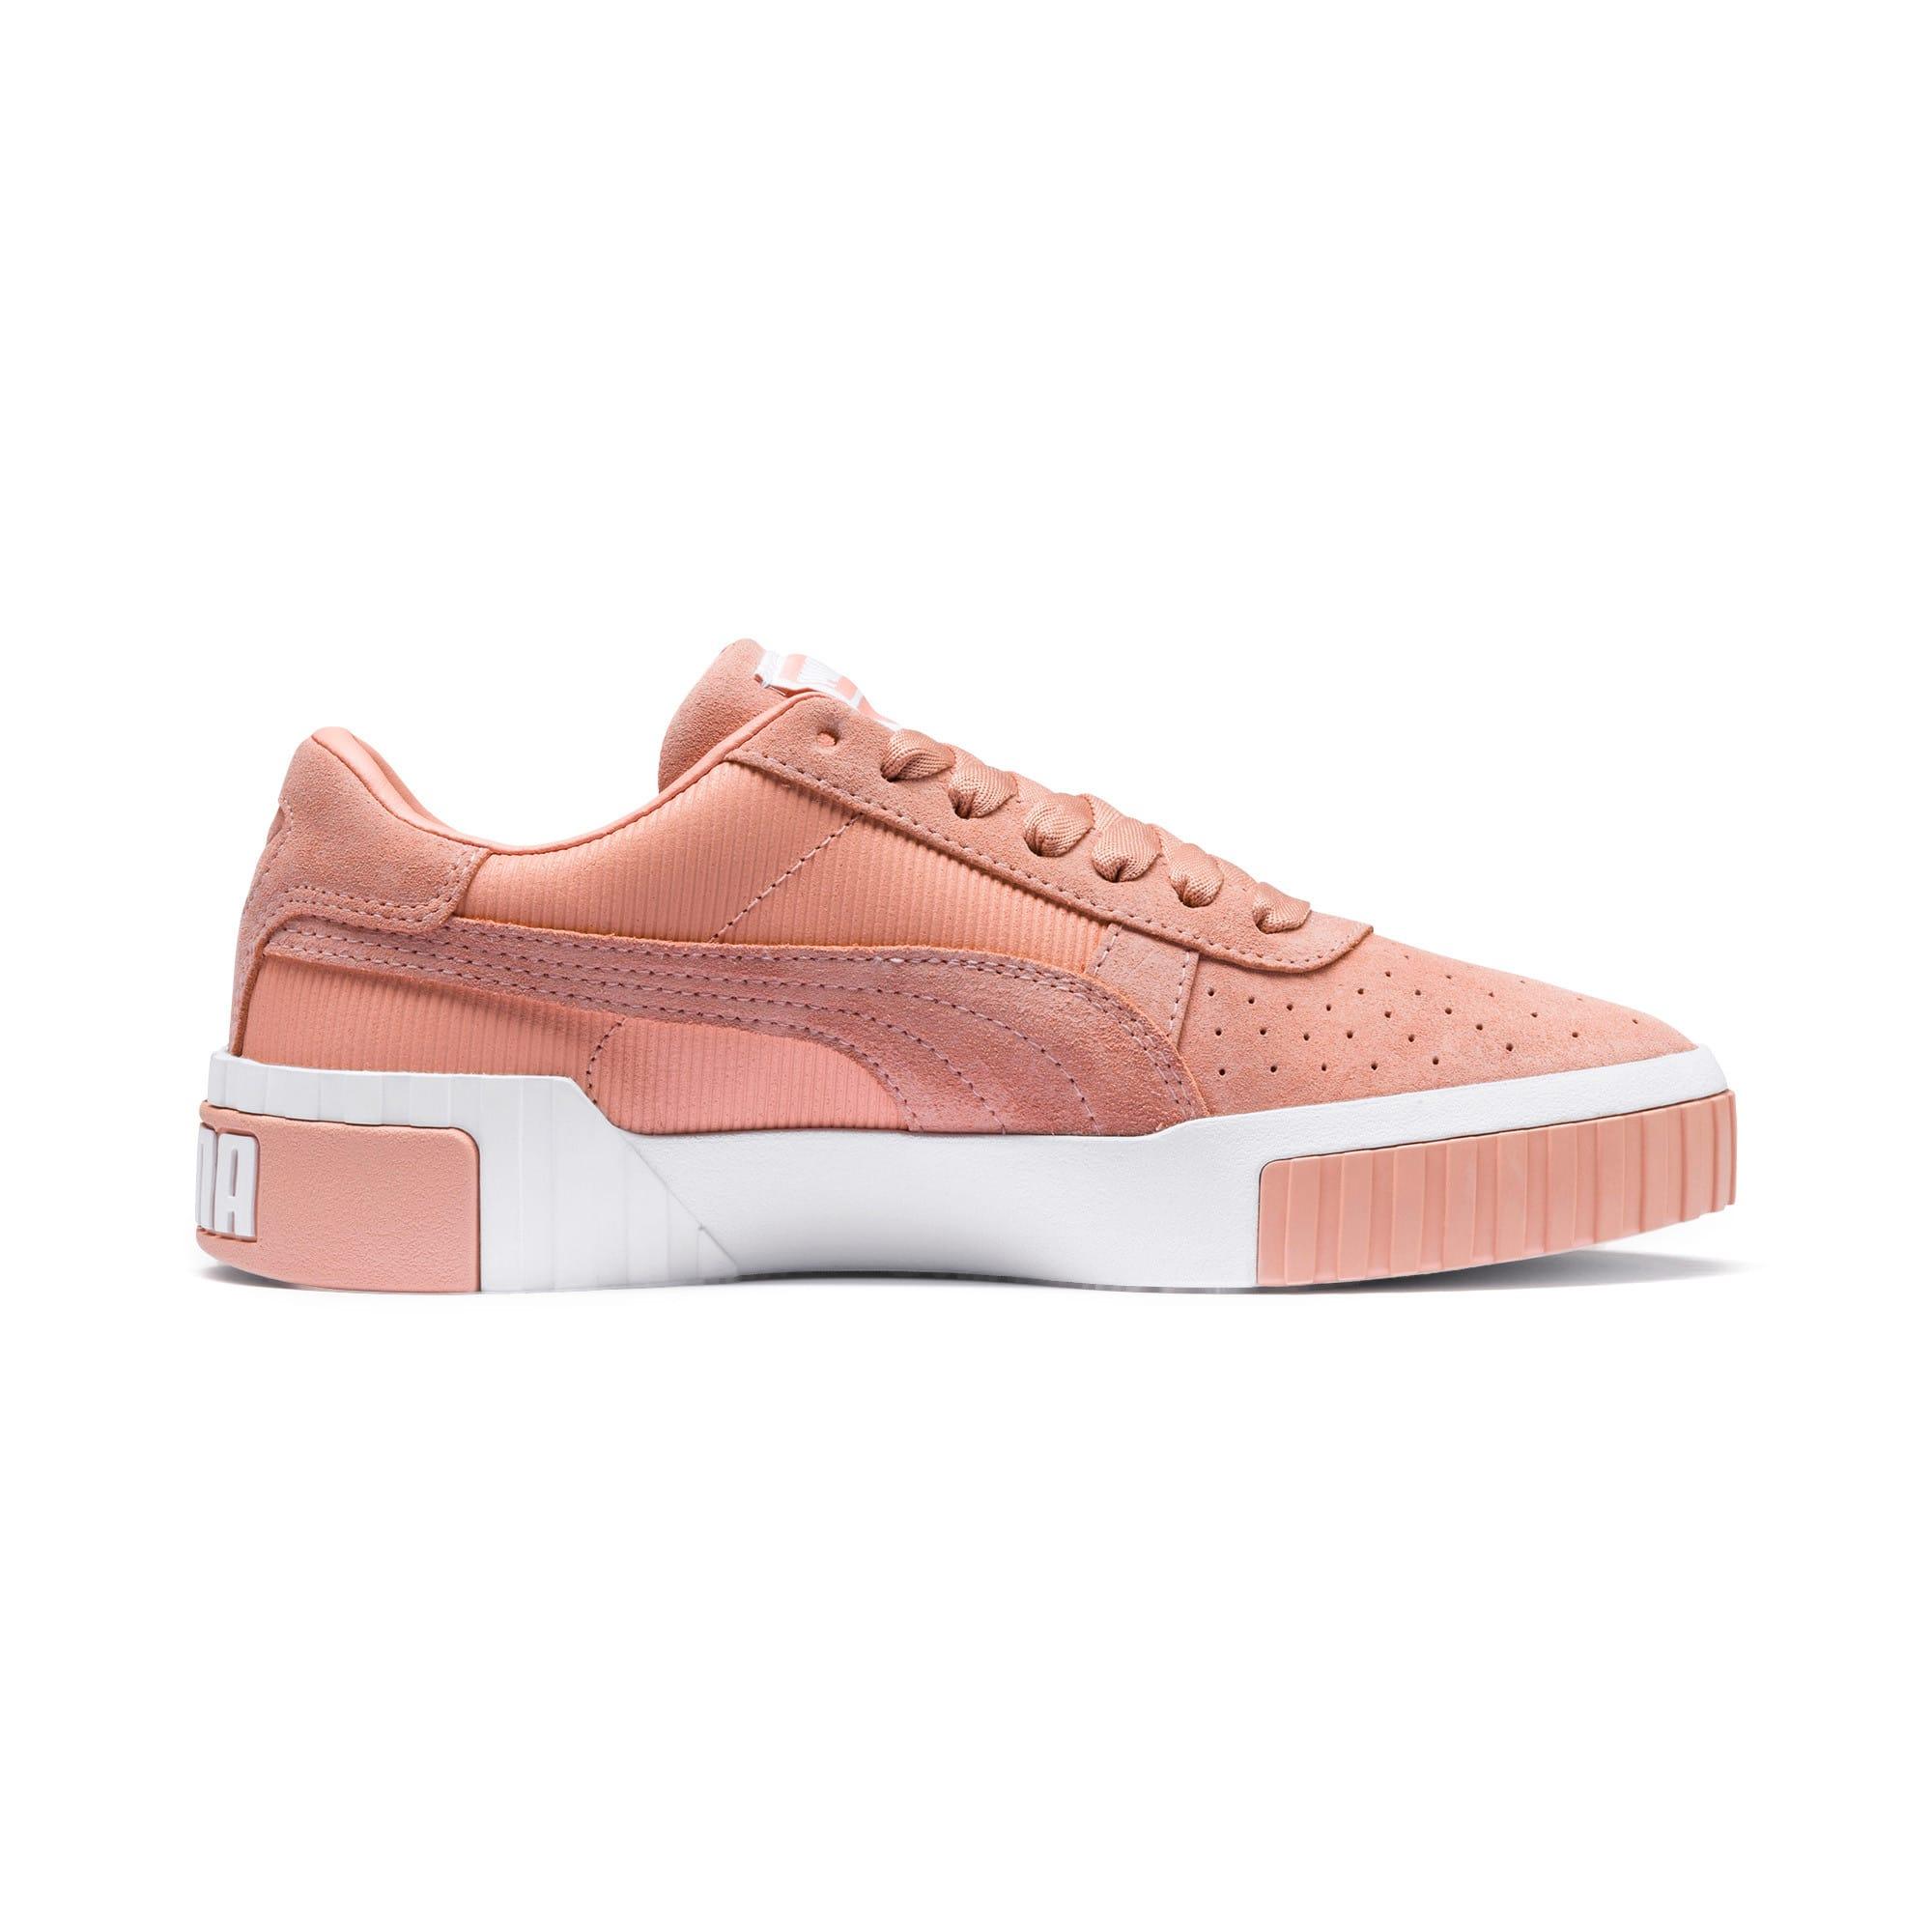 Thumbnail 6 of Cali Palm Springs Women's Sneakers, Peach Bud, medium